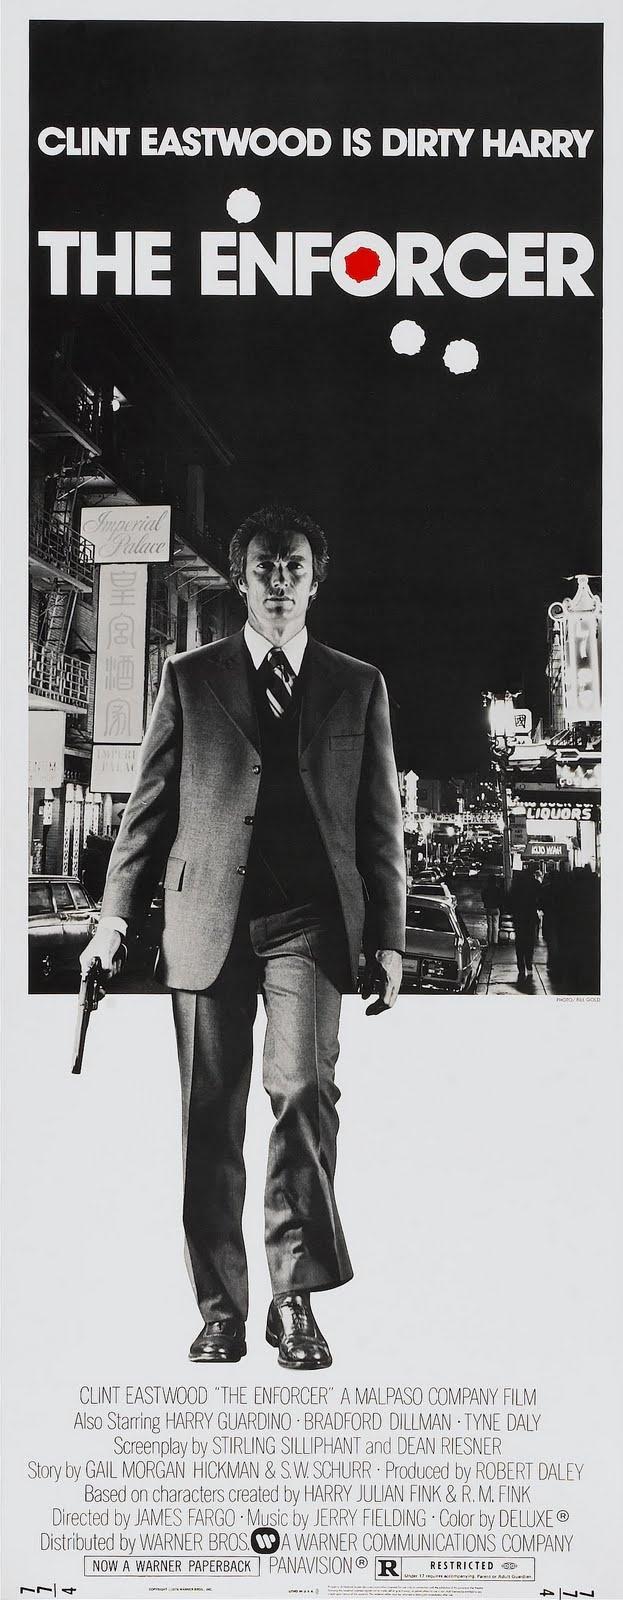 """The Enforcer"" (1976) / Director: James Fargo / Writers: Harry Julian Fink (characters), Rita M. Fink (characters) / Stars: Clint Eastwood, Tyne Daly, Harry Guardino # still"